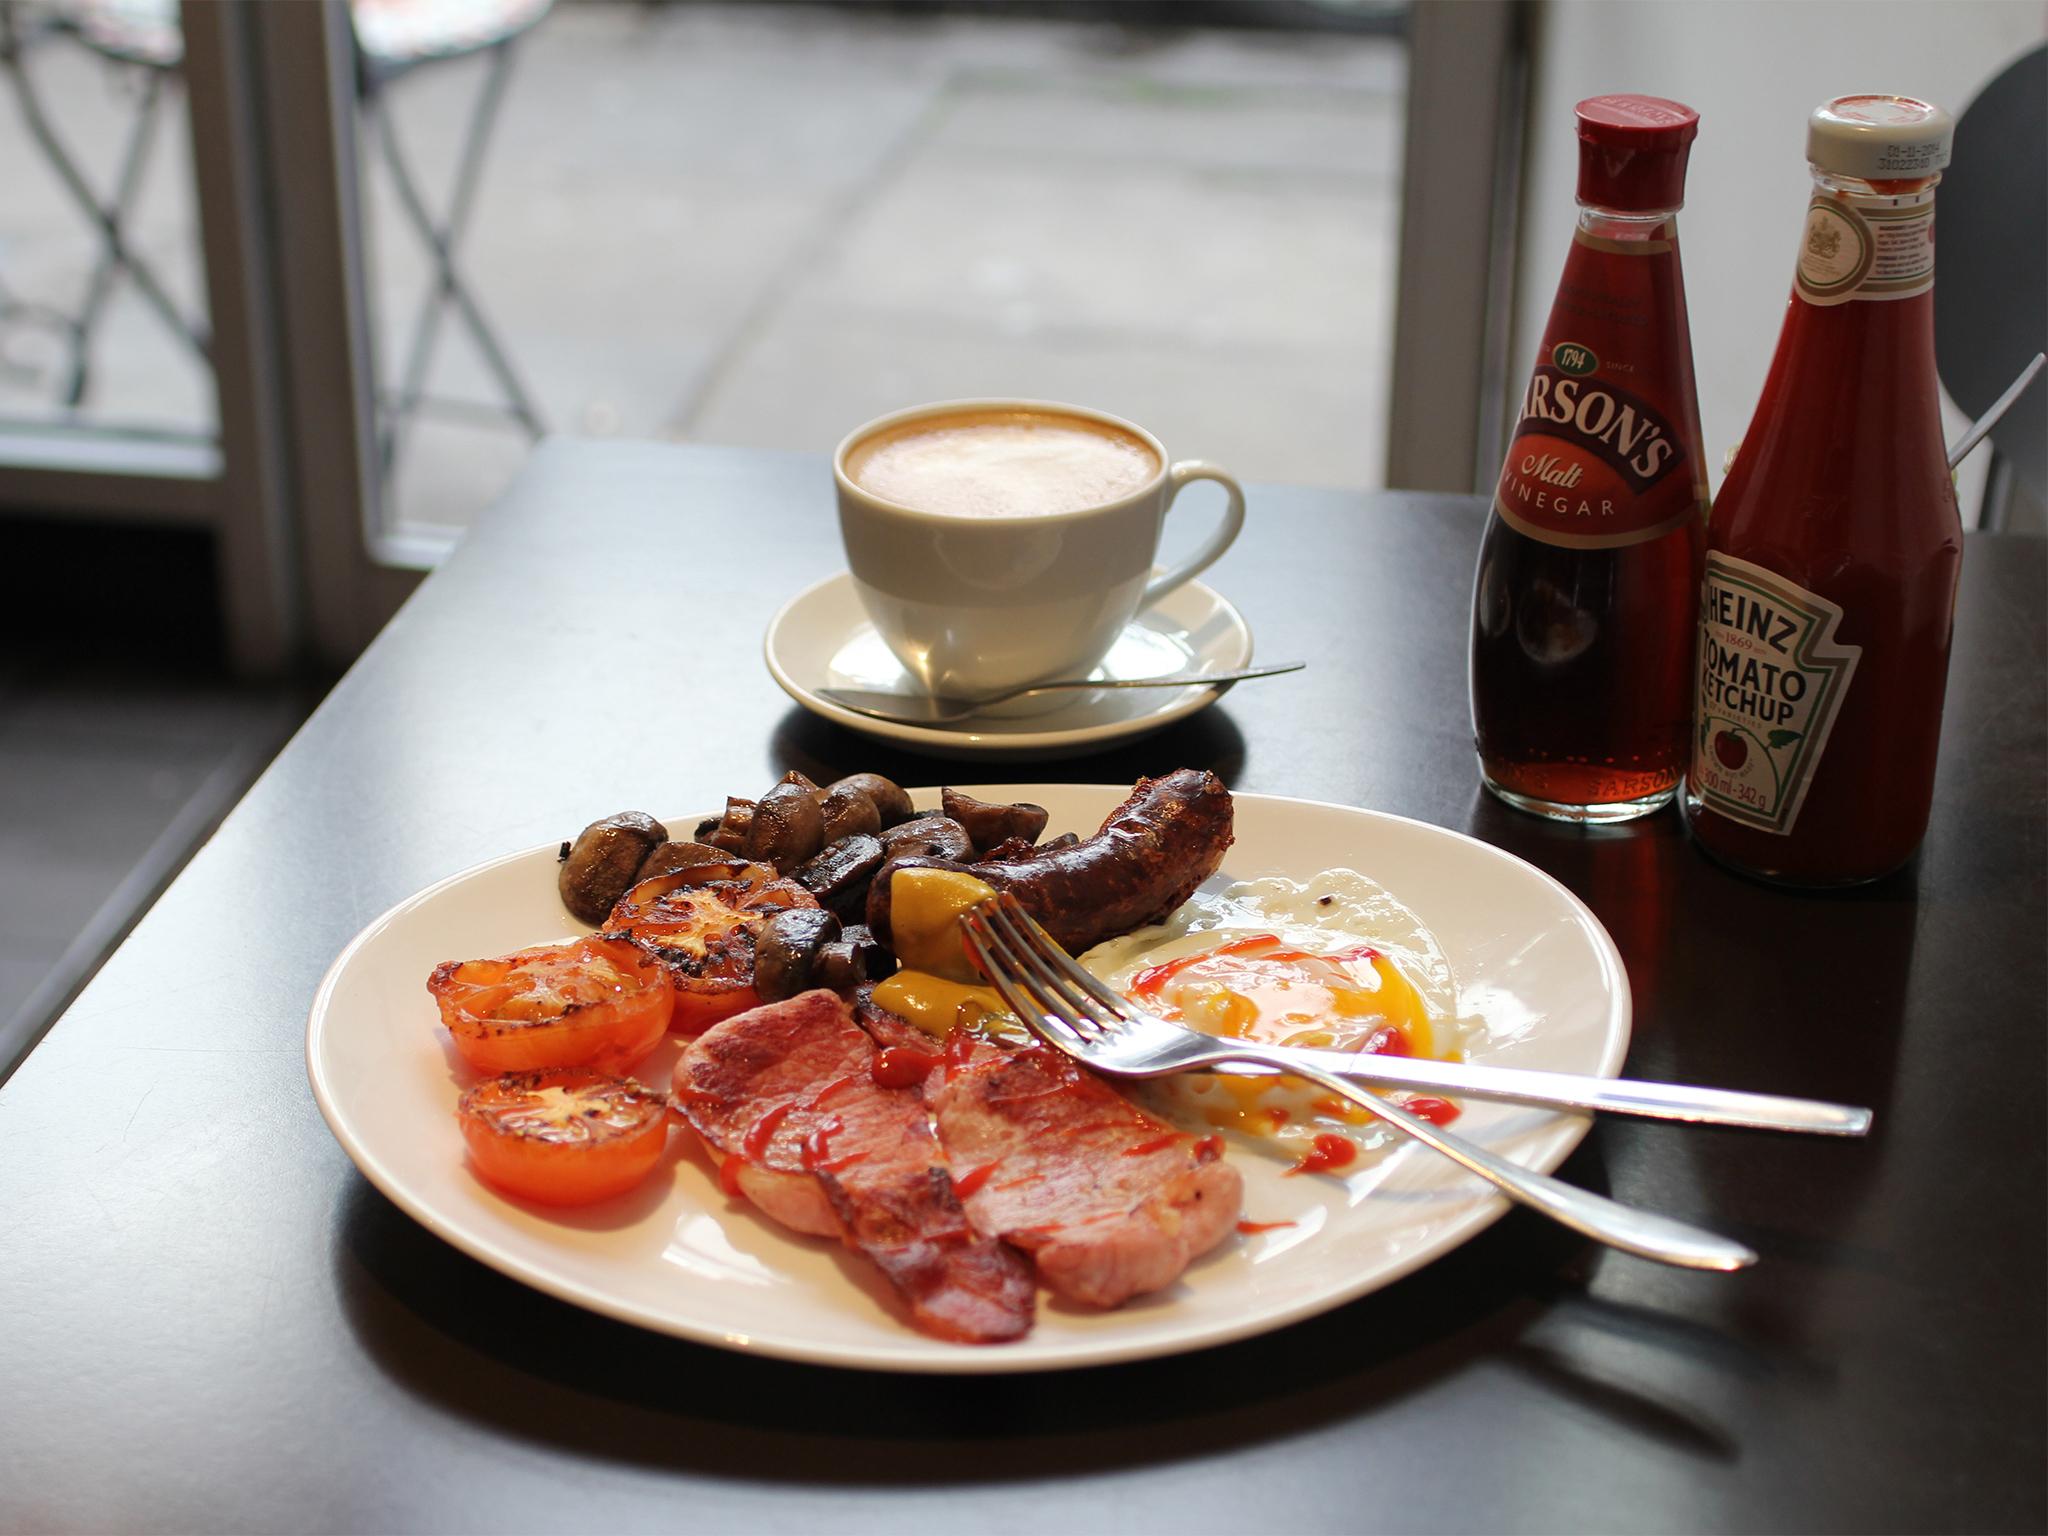 Mario's Café | Restaurants in Kentish Town, London